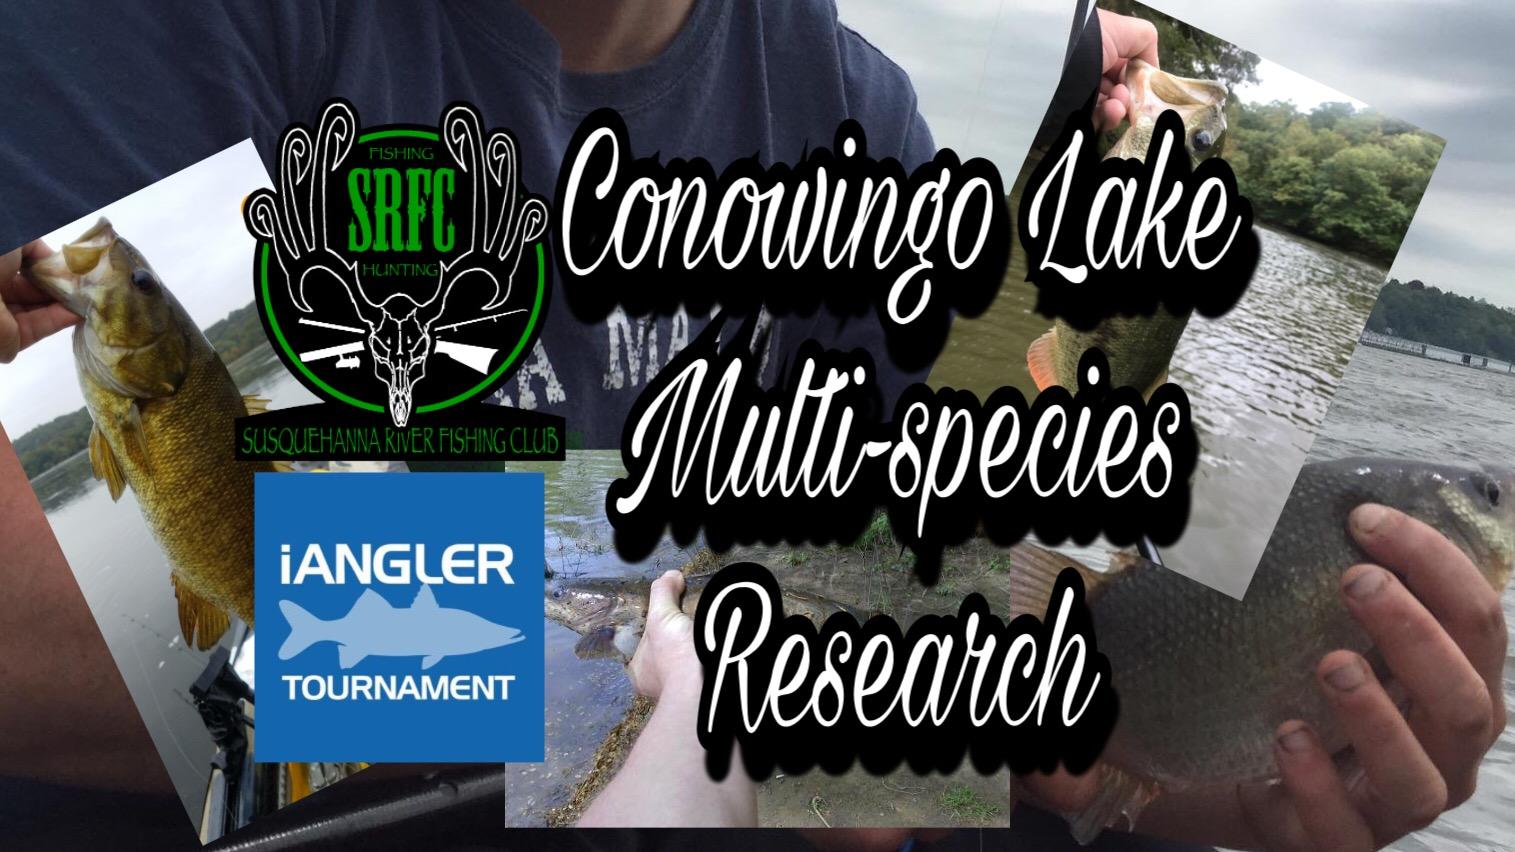 SRFC - 2018 Conowingo Lake Multi-Species Research